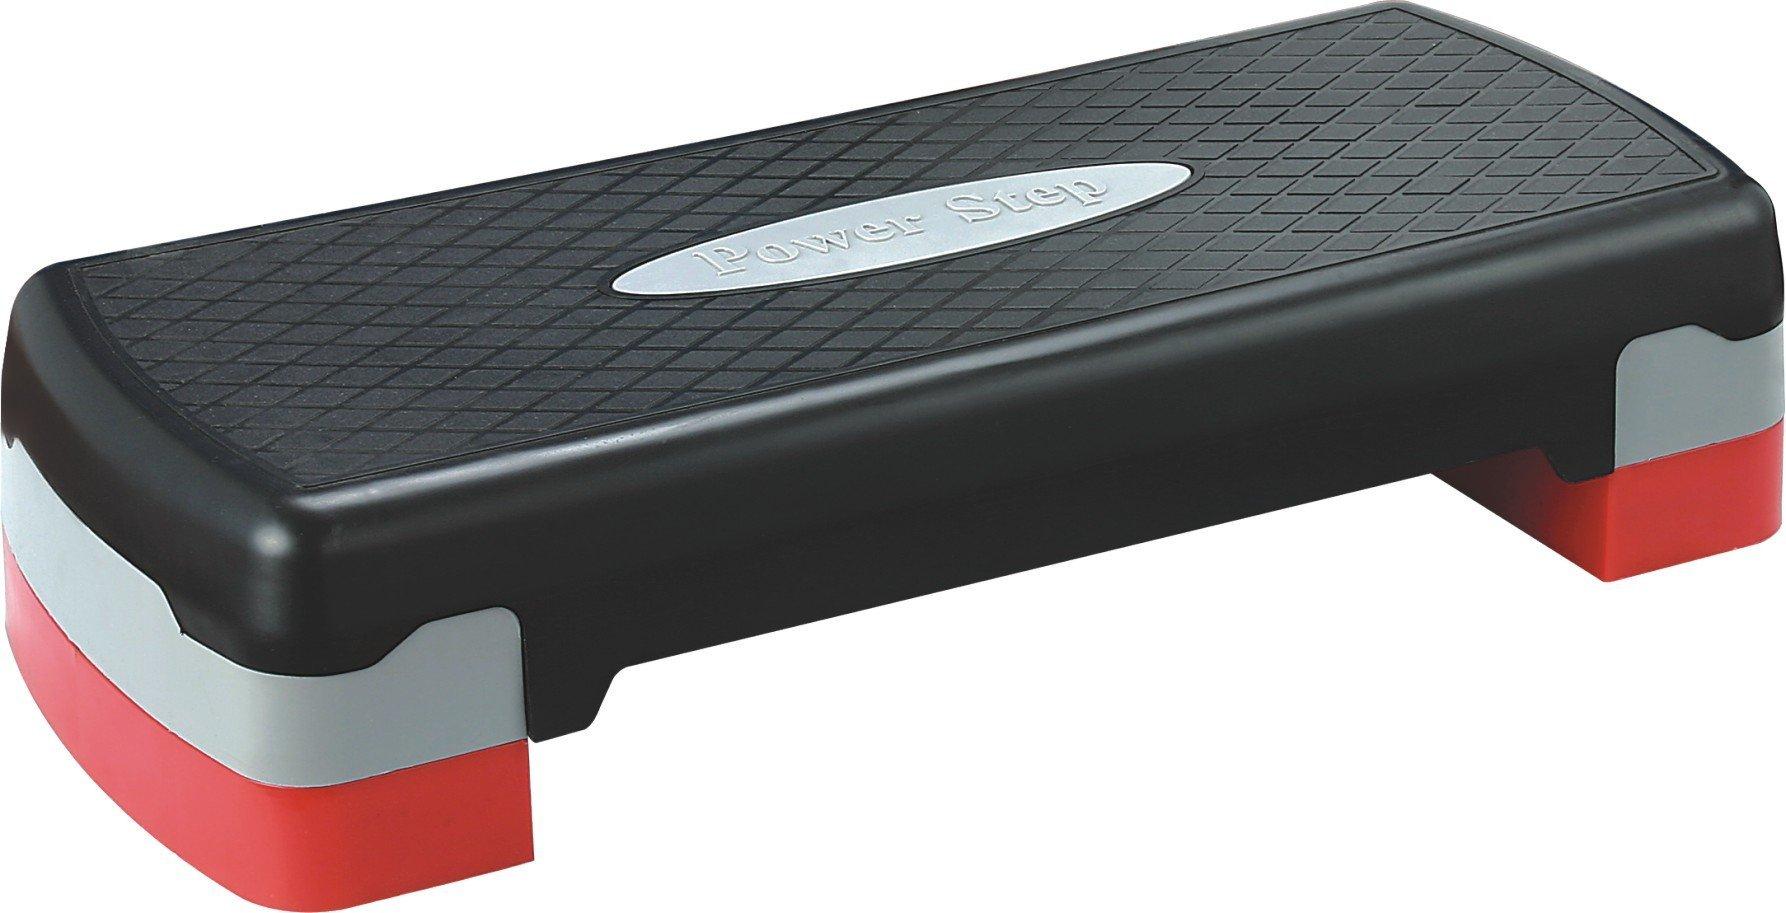 KLB Sport 27'' Adjustable Exercise Equipment Step Platform with 2 Risers